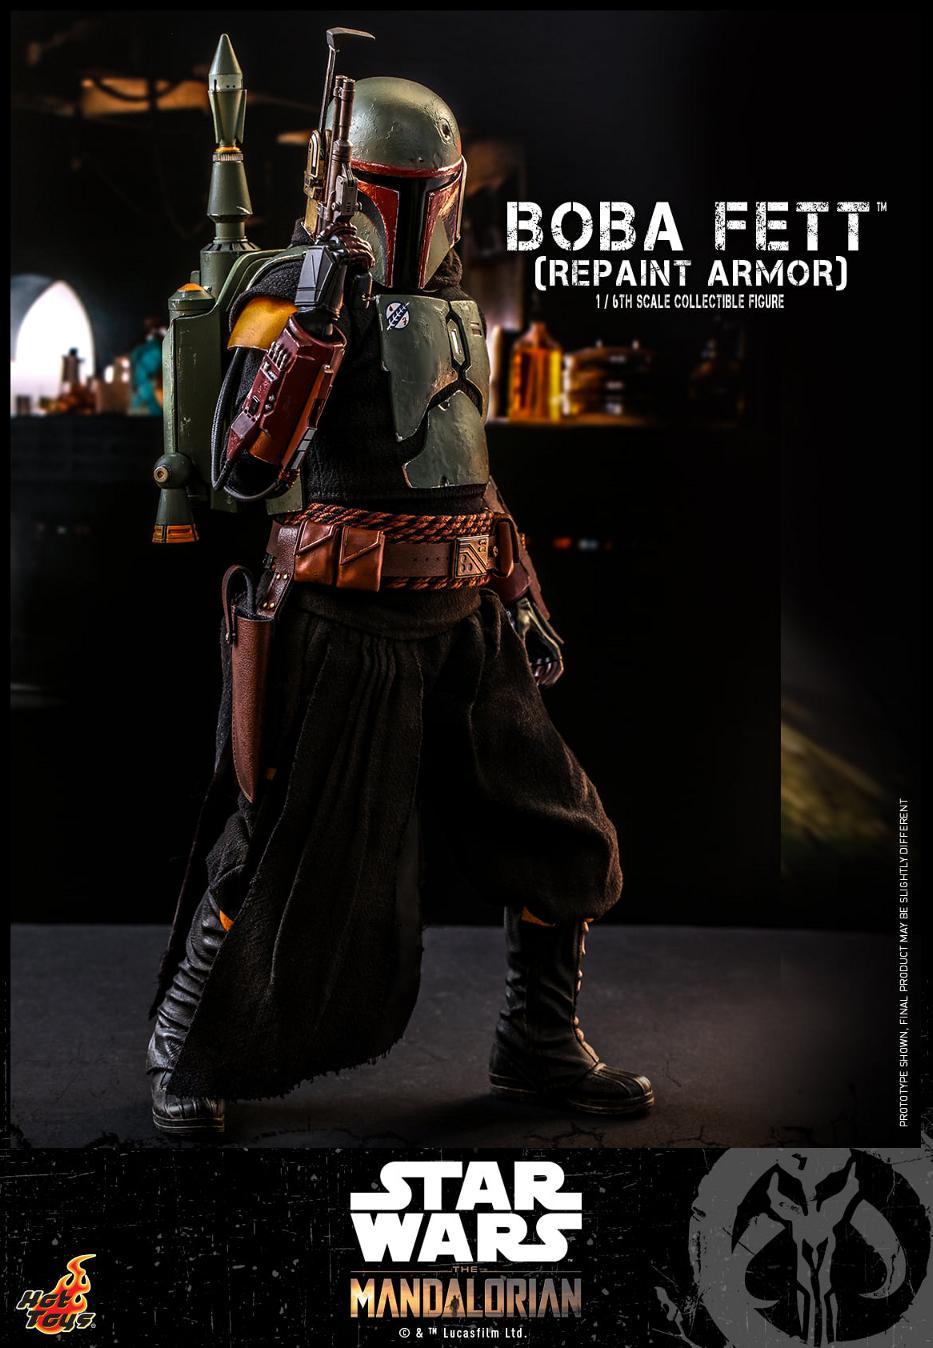 Boba Fett (Repaint Armor) Collectible Figure - Hot Toys Boba_f64